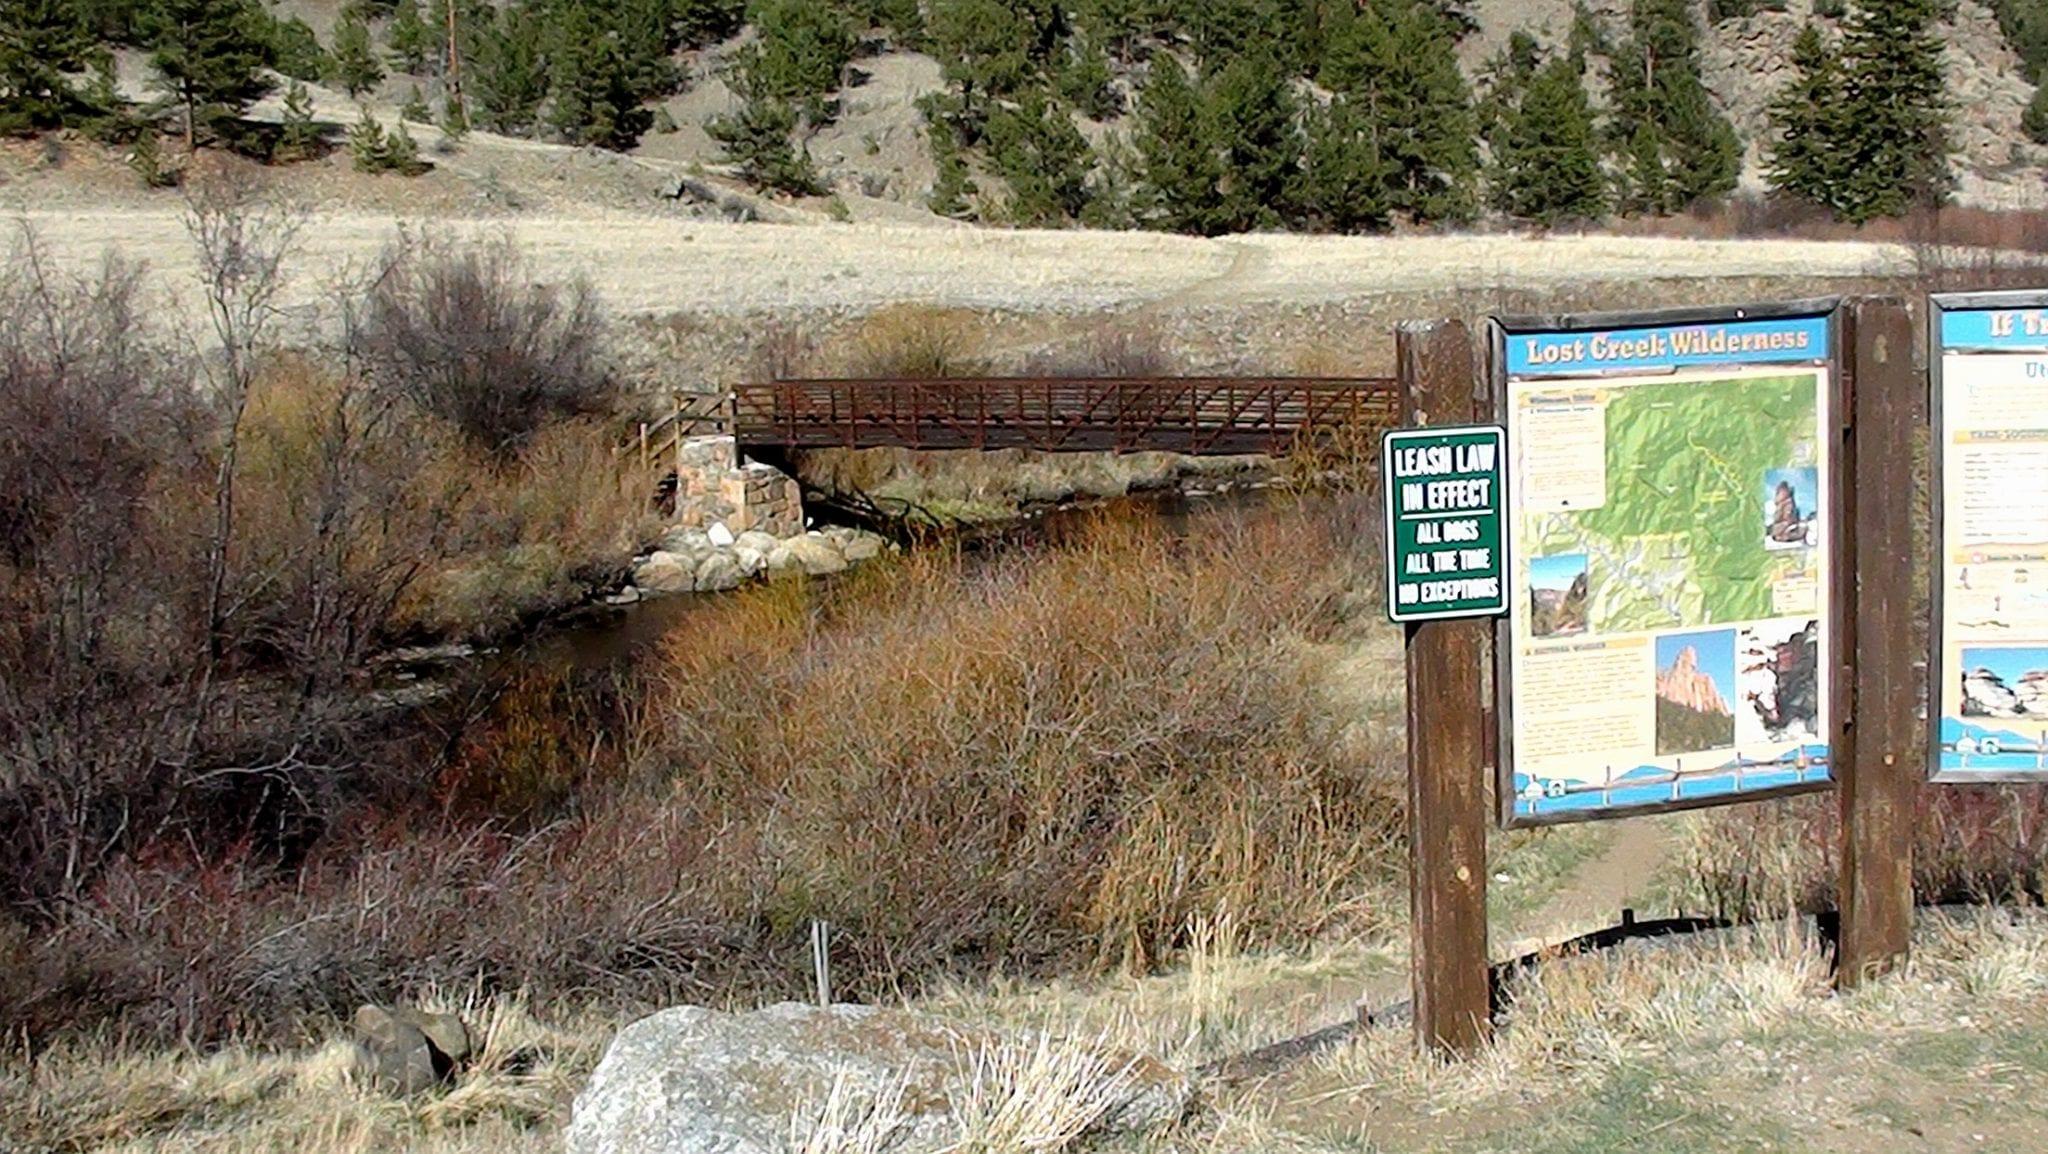 Ute Trail Lost Creek Wilderness South Park Colorado